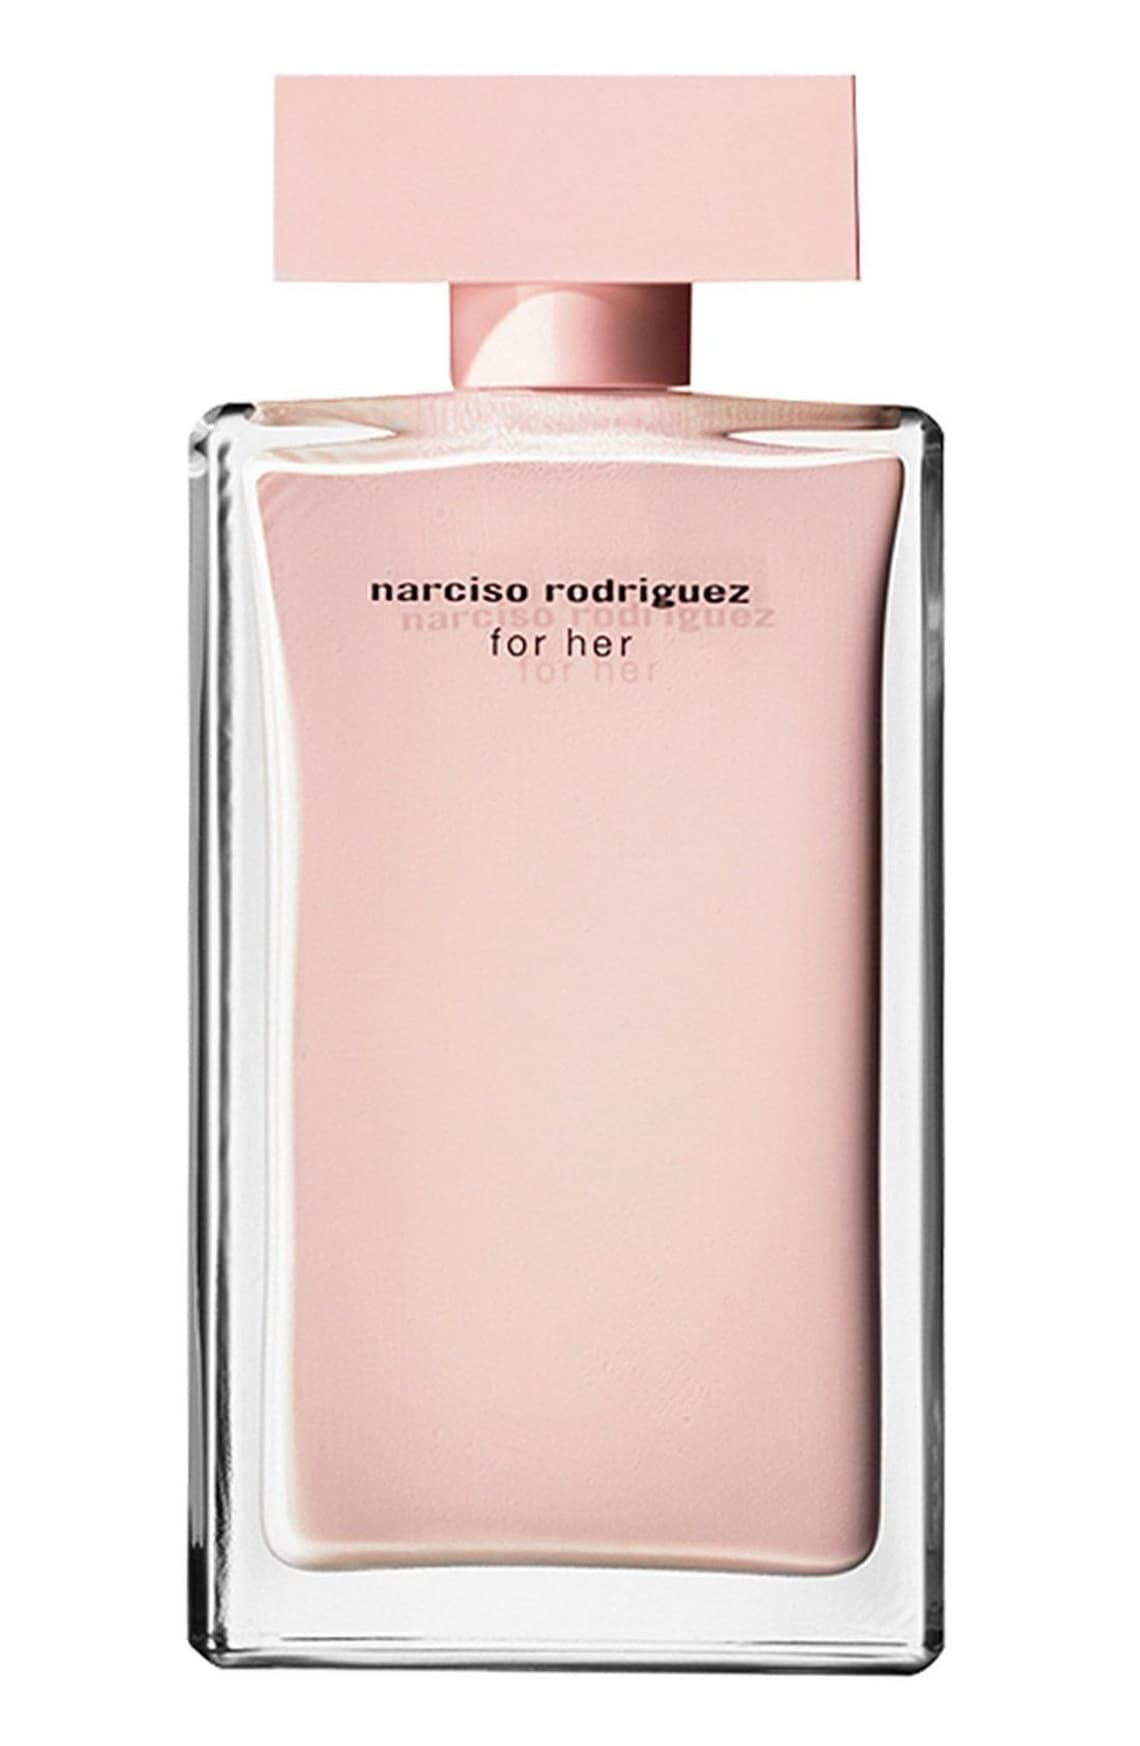 Narciso Rodriguez For Her Eau de Parfum | Nordstrom in 2020